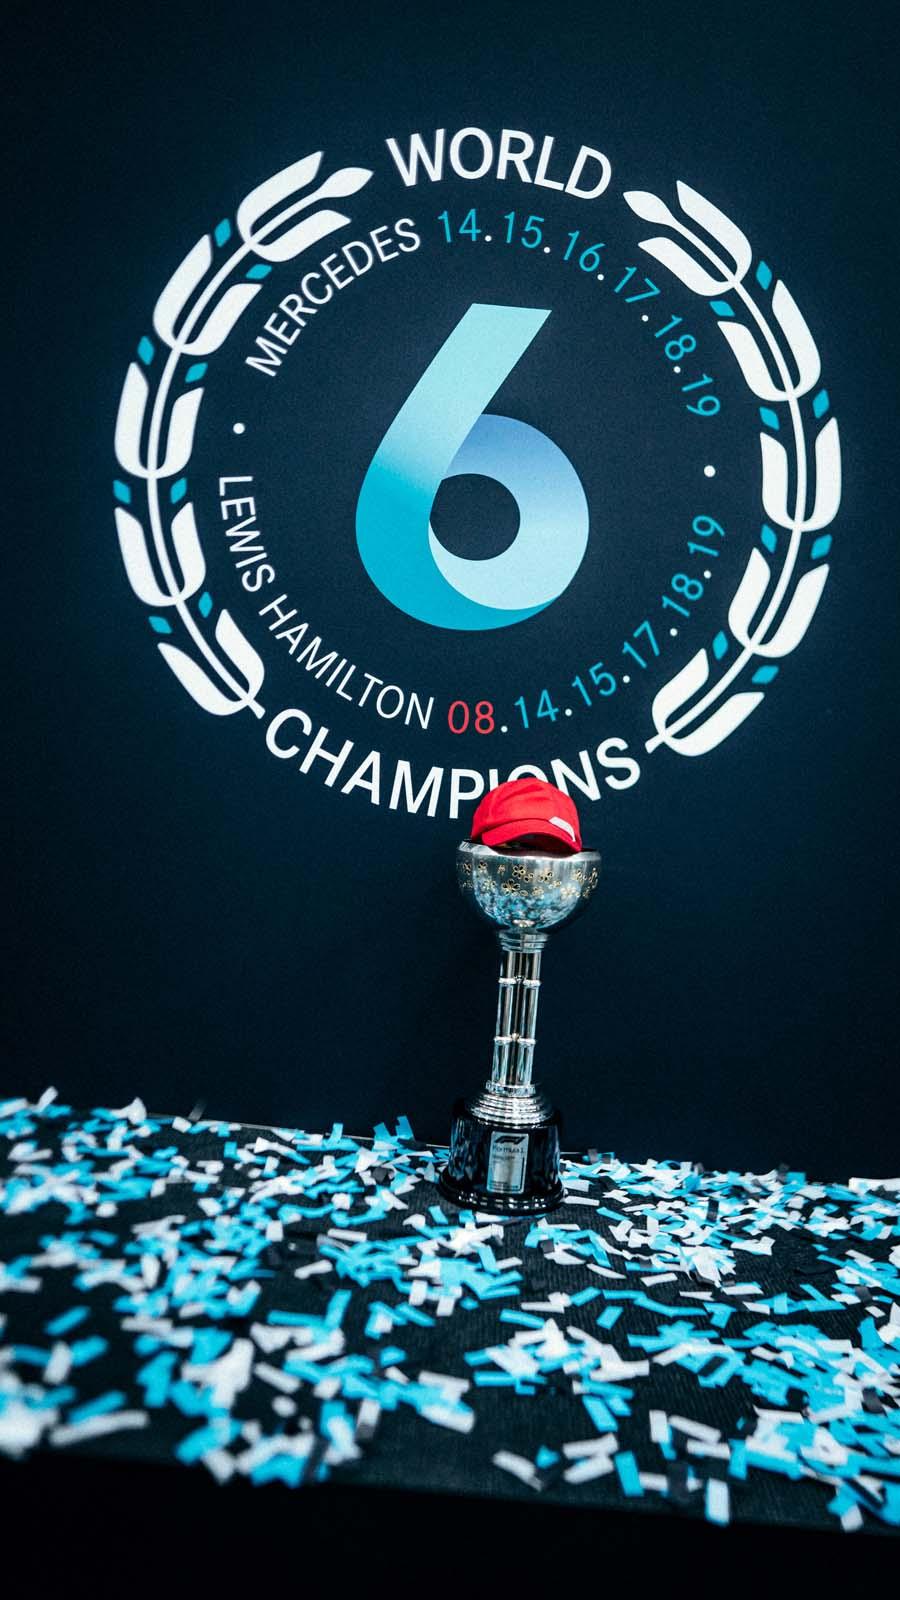 2019 Championship Celebrations - Brackley and Brixworth - Sebastian Kawka